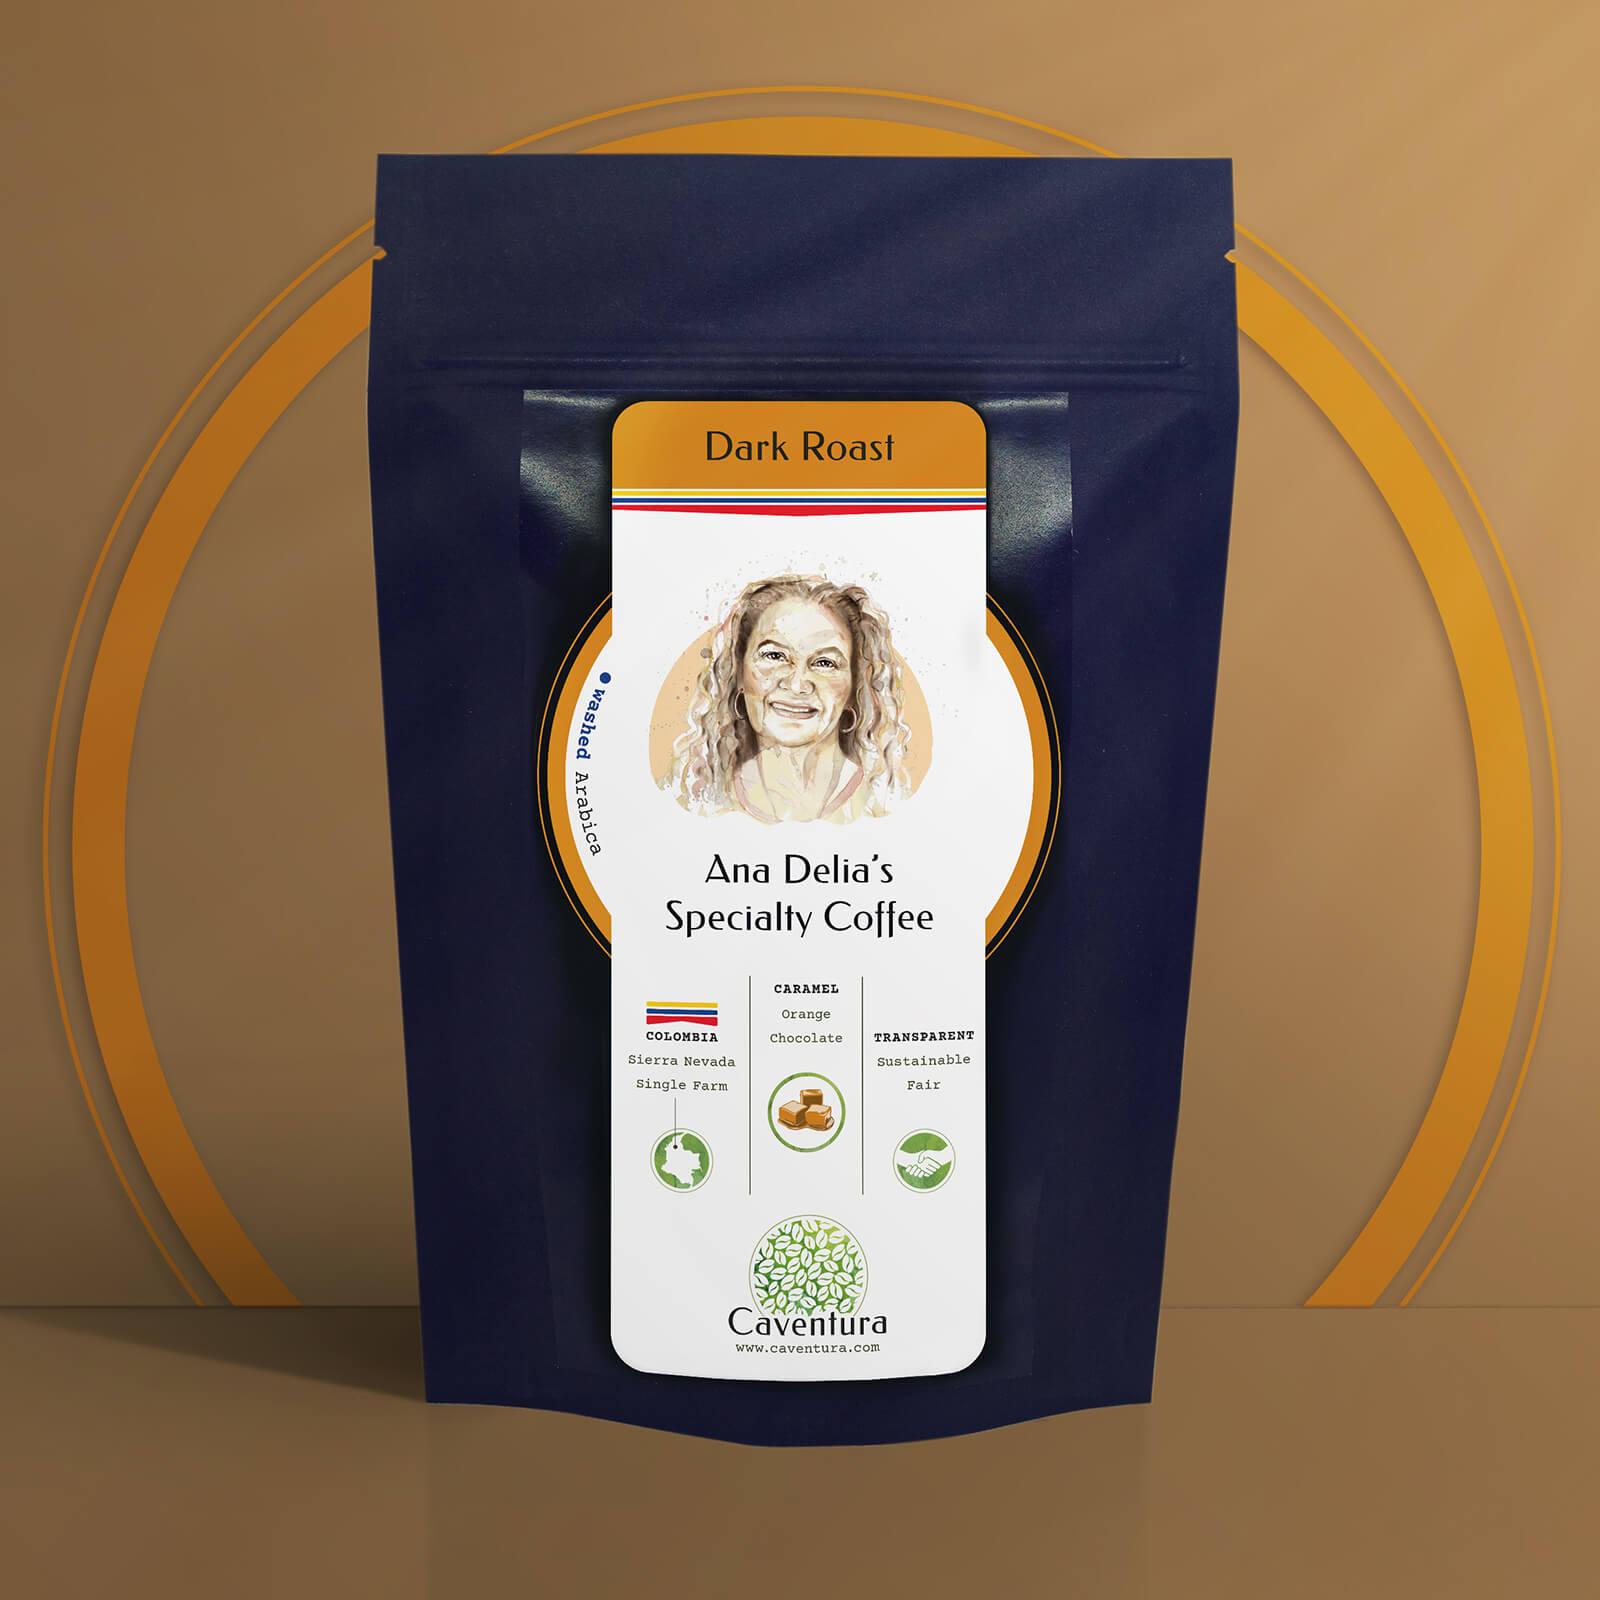 Ana Delia's Specialty Coffee – Dark Roast